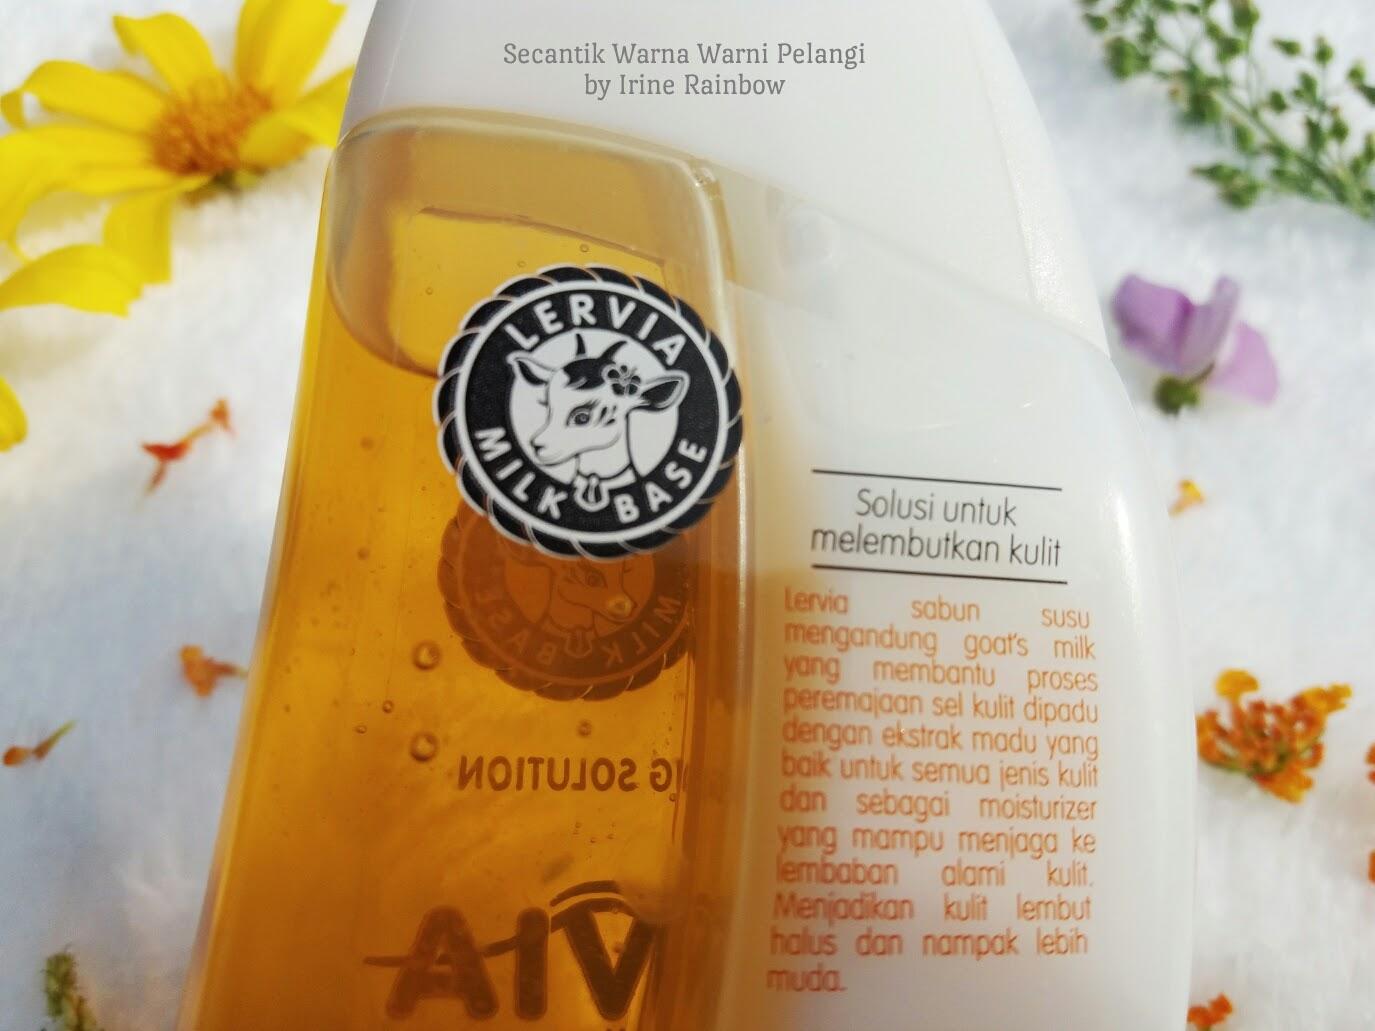 Review Lervia Milk Shower Cream Plus Honey Citra Sabun Lulur Pearly White Batang Dapat 2 Adalah Mandi Yang Mengandung Goats Atau Susu Kambing Membantu Proses Peremajaan Sel Kulit Dipadu Dengan